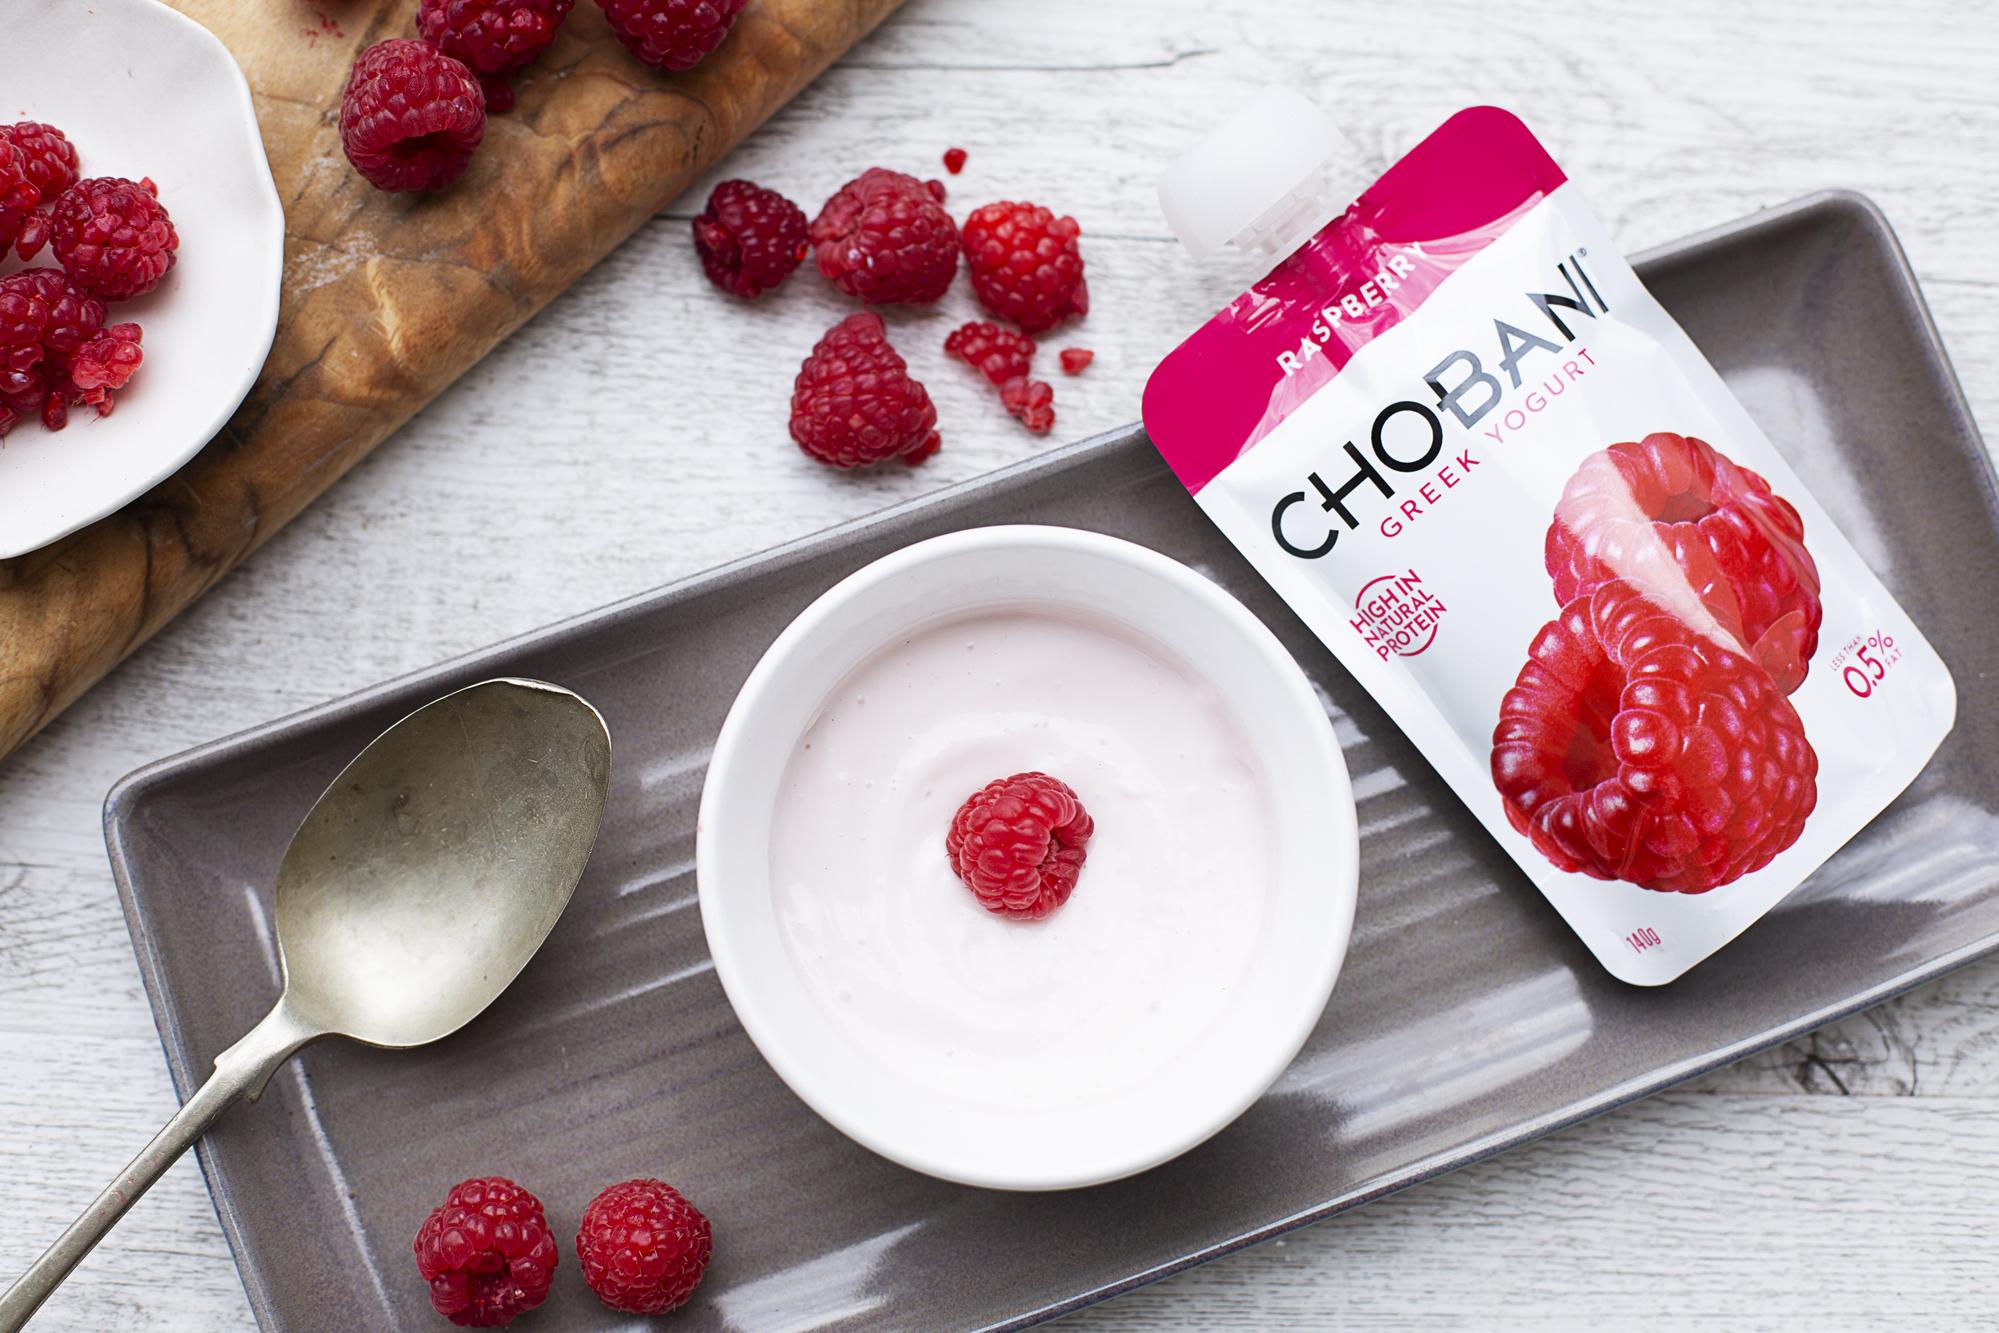 412. NEW! Chobani Pouch Raspberry Yoghurt